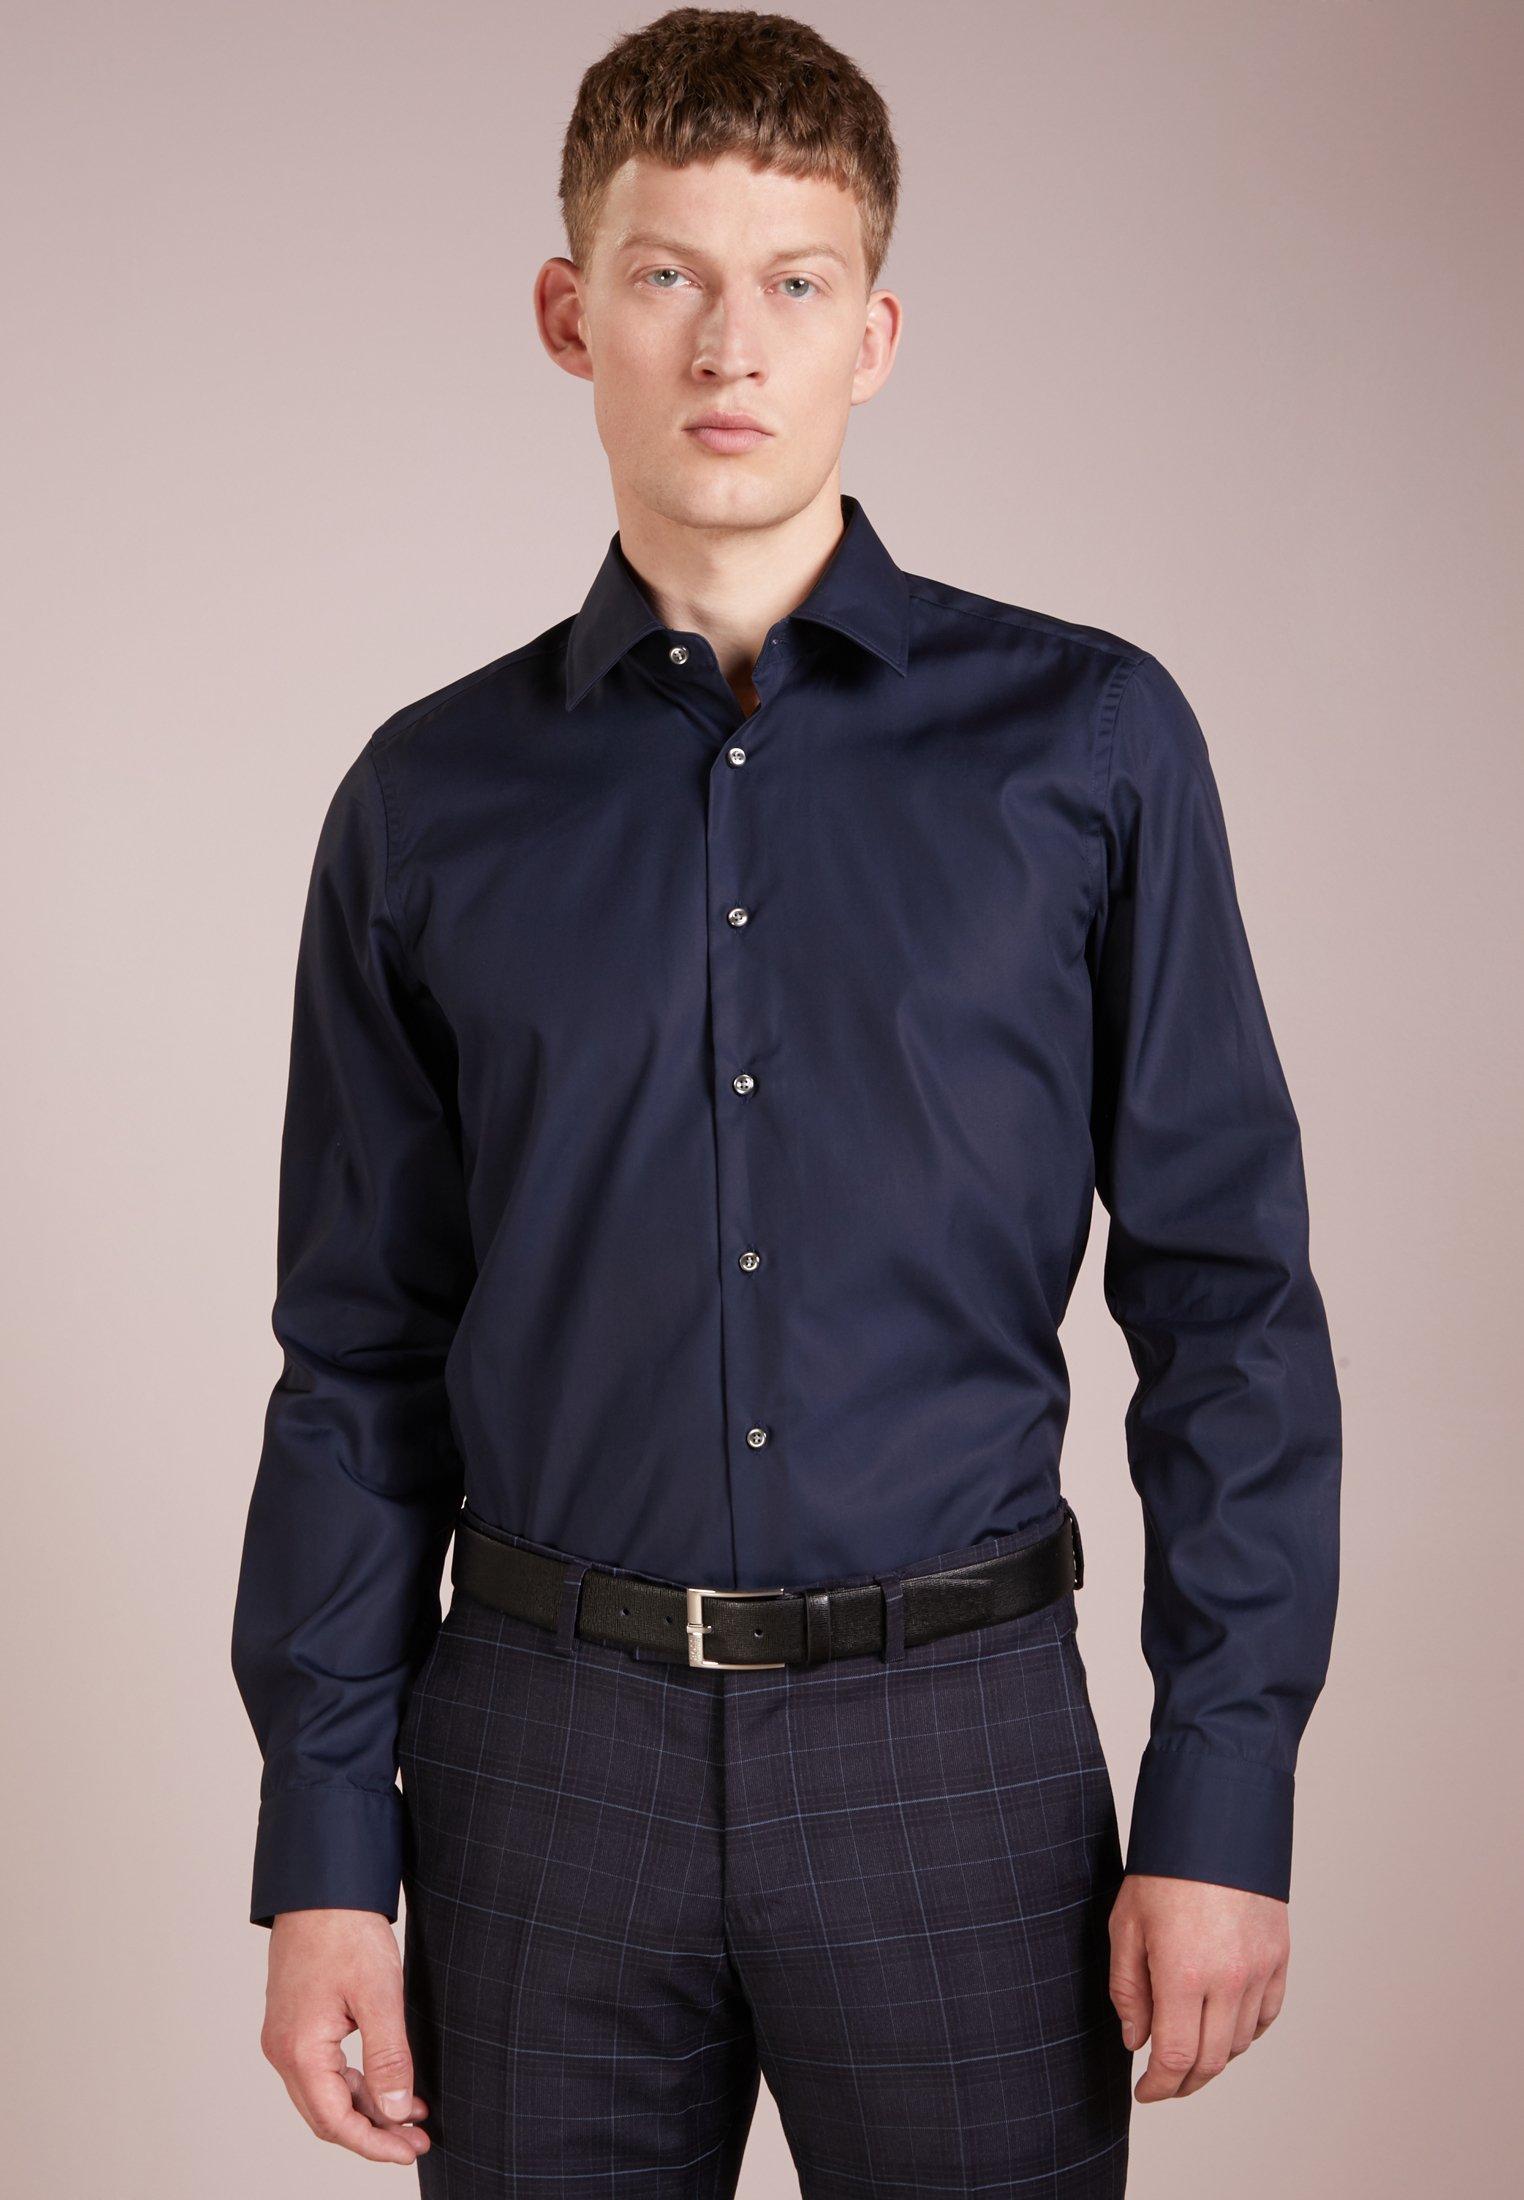 JOOP! PIERCE SLIM FIT - Koszula biznesowa - dark blue - Odzież męska 2020